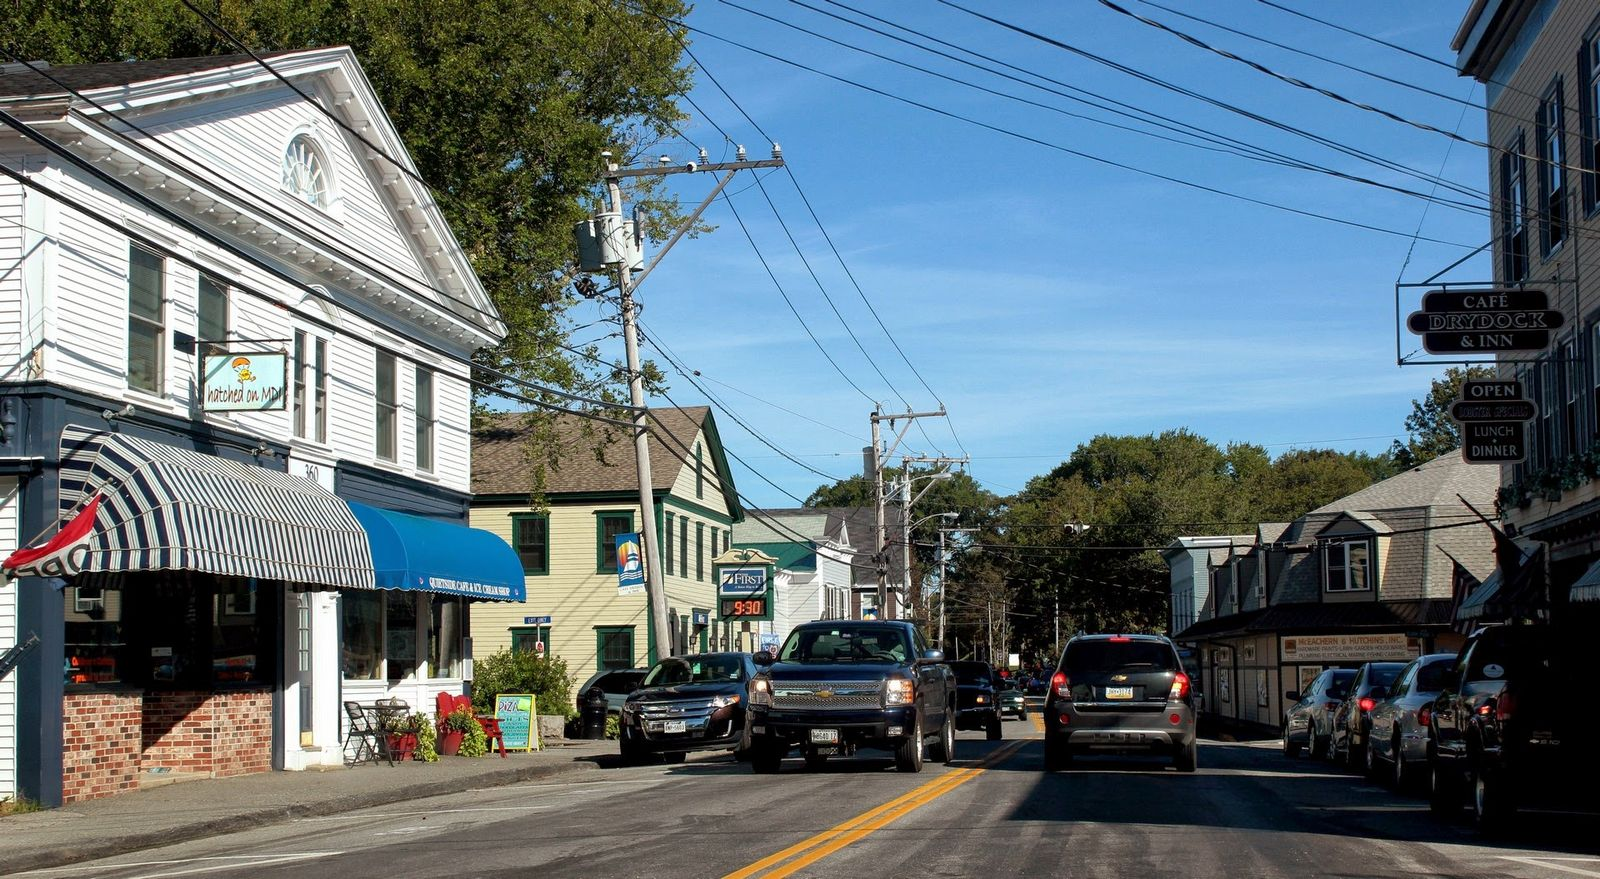 Calles de Southweast Harbor